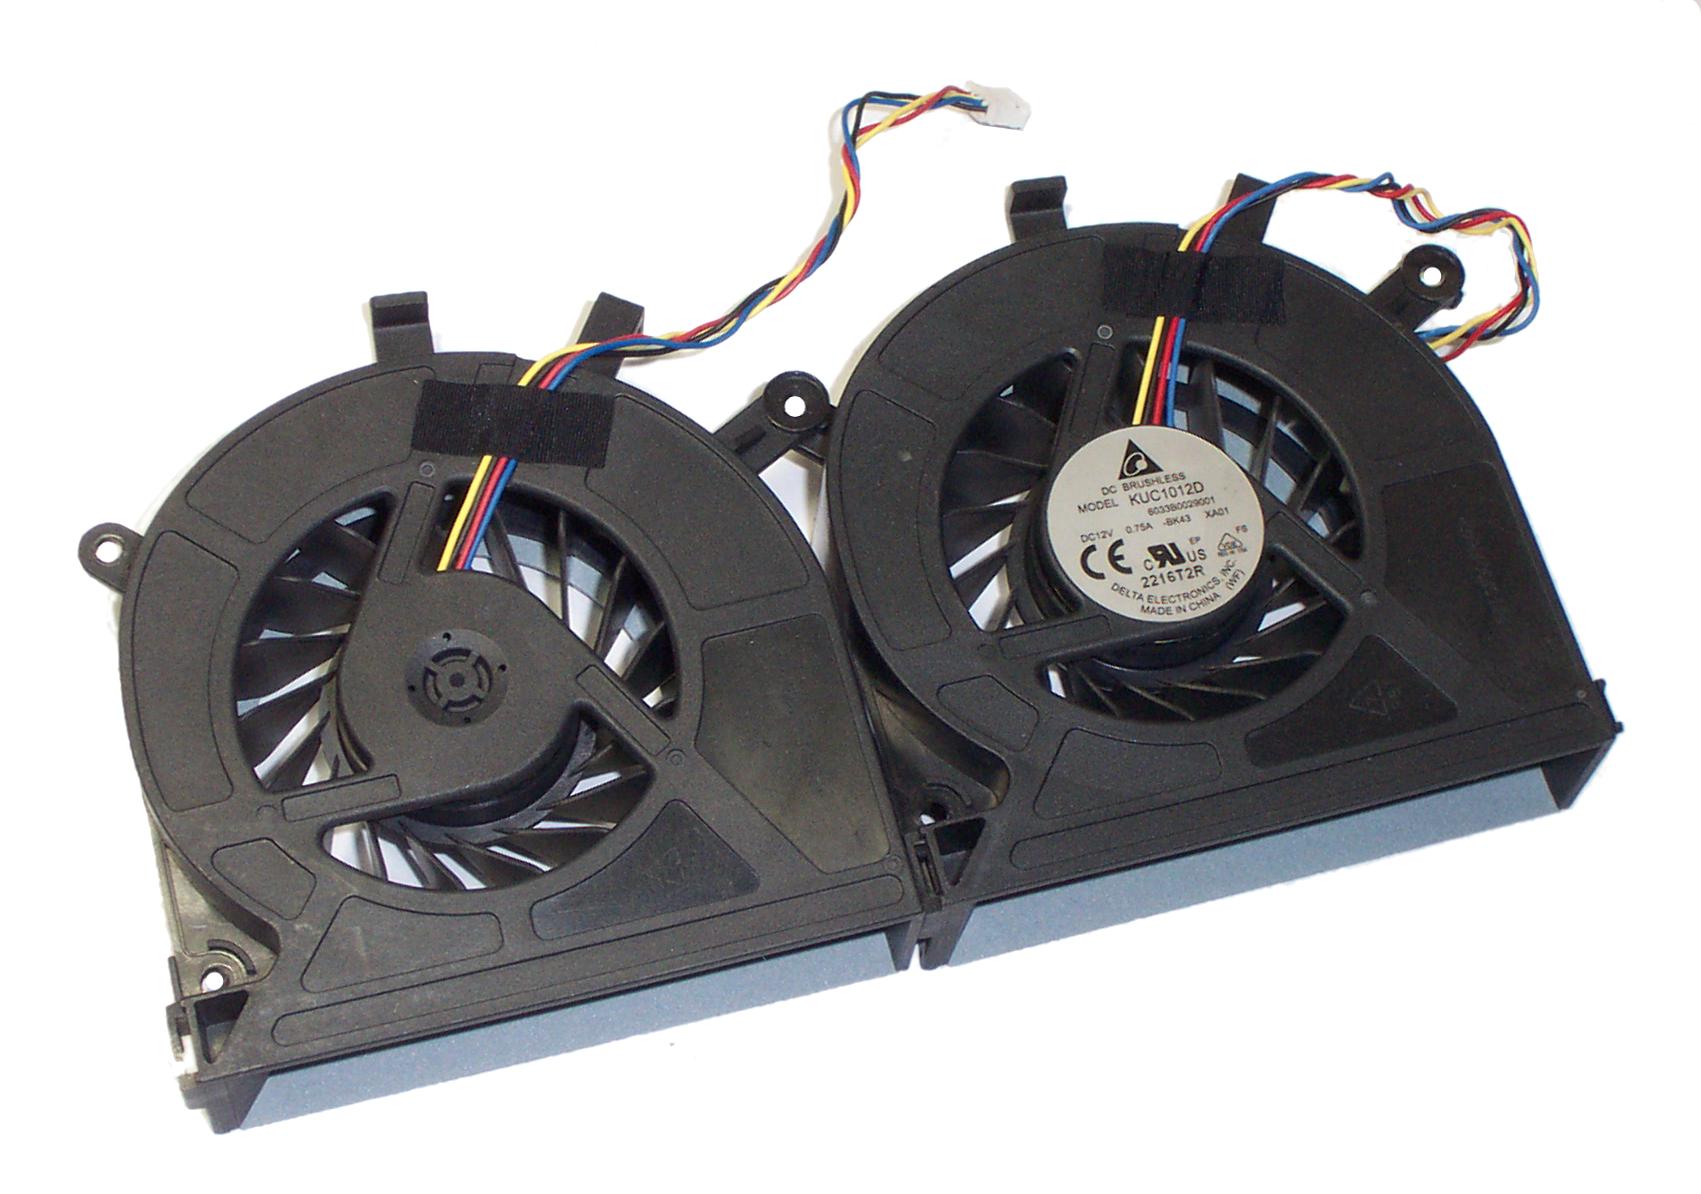 Delta Electronics 12V 0.75A Twin Brushless Fan Assembly KUC1012D -BK43